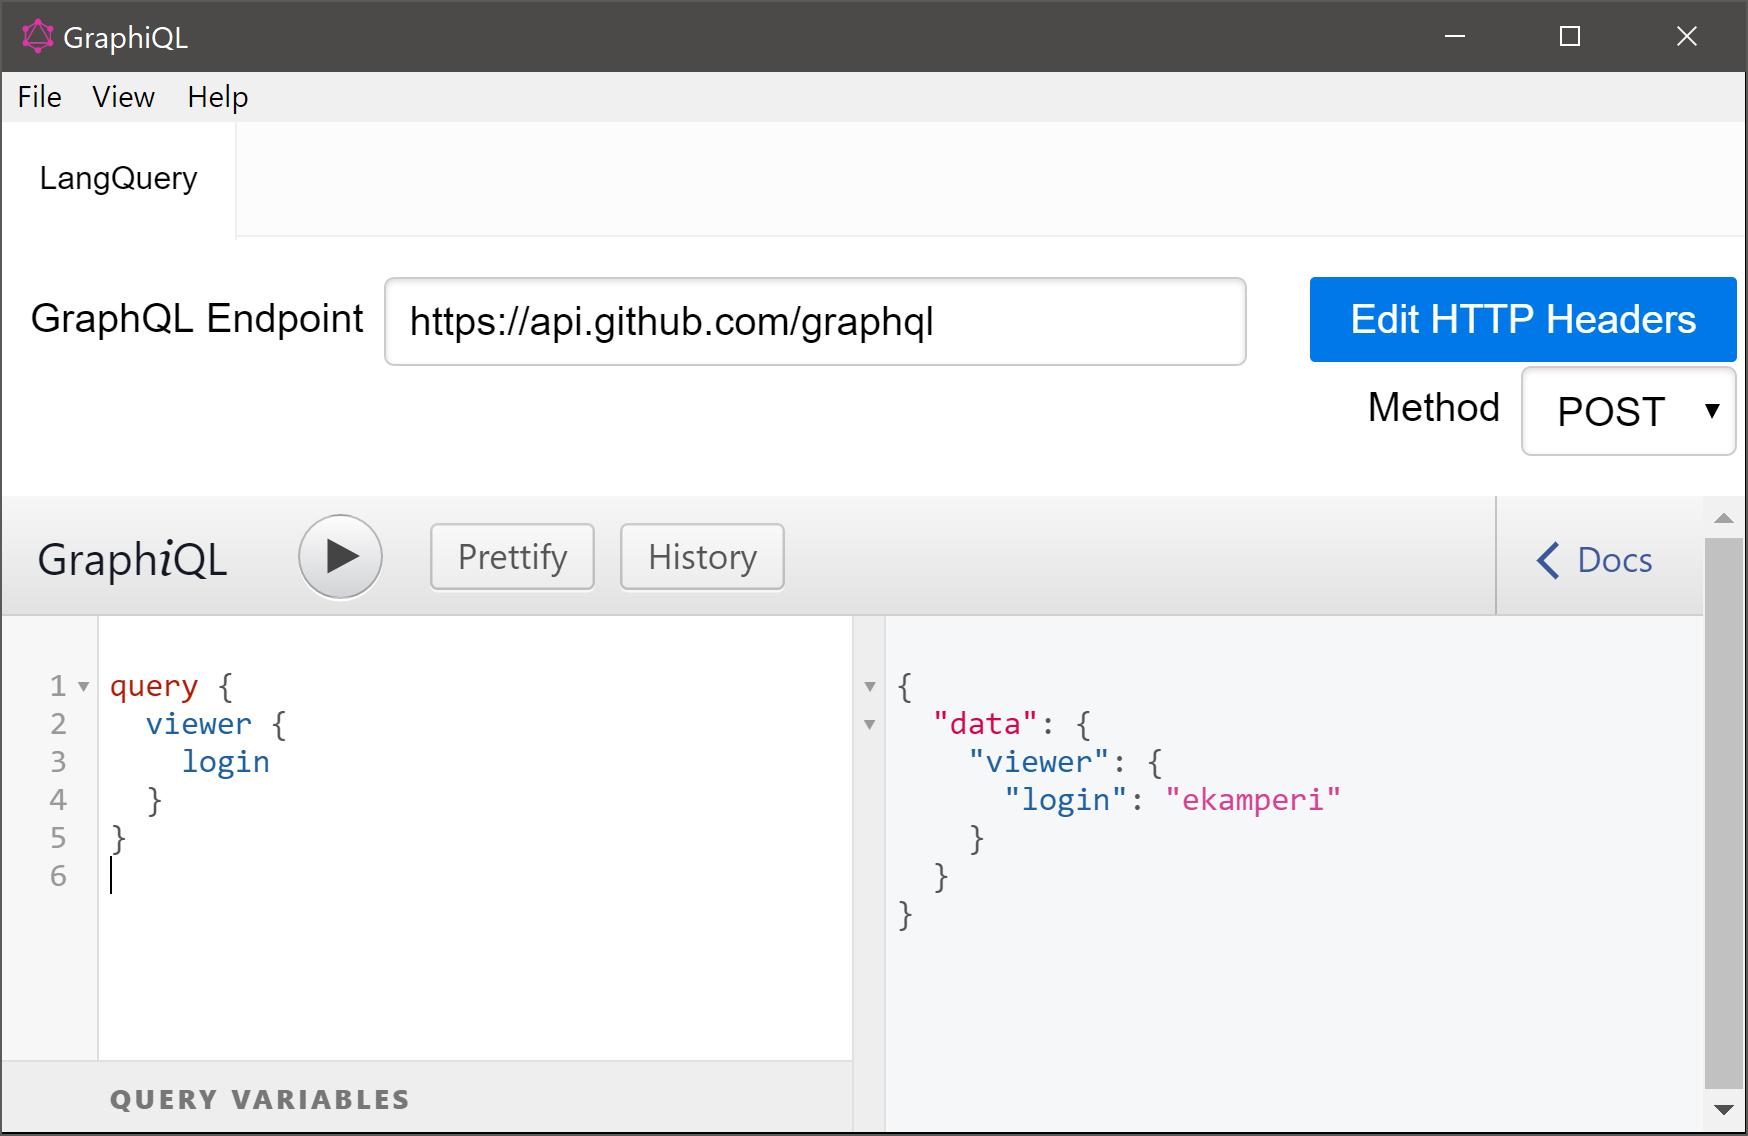 GraphiQL screenshot